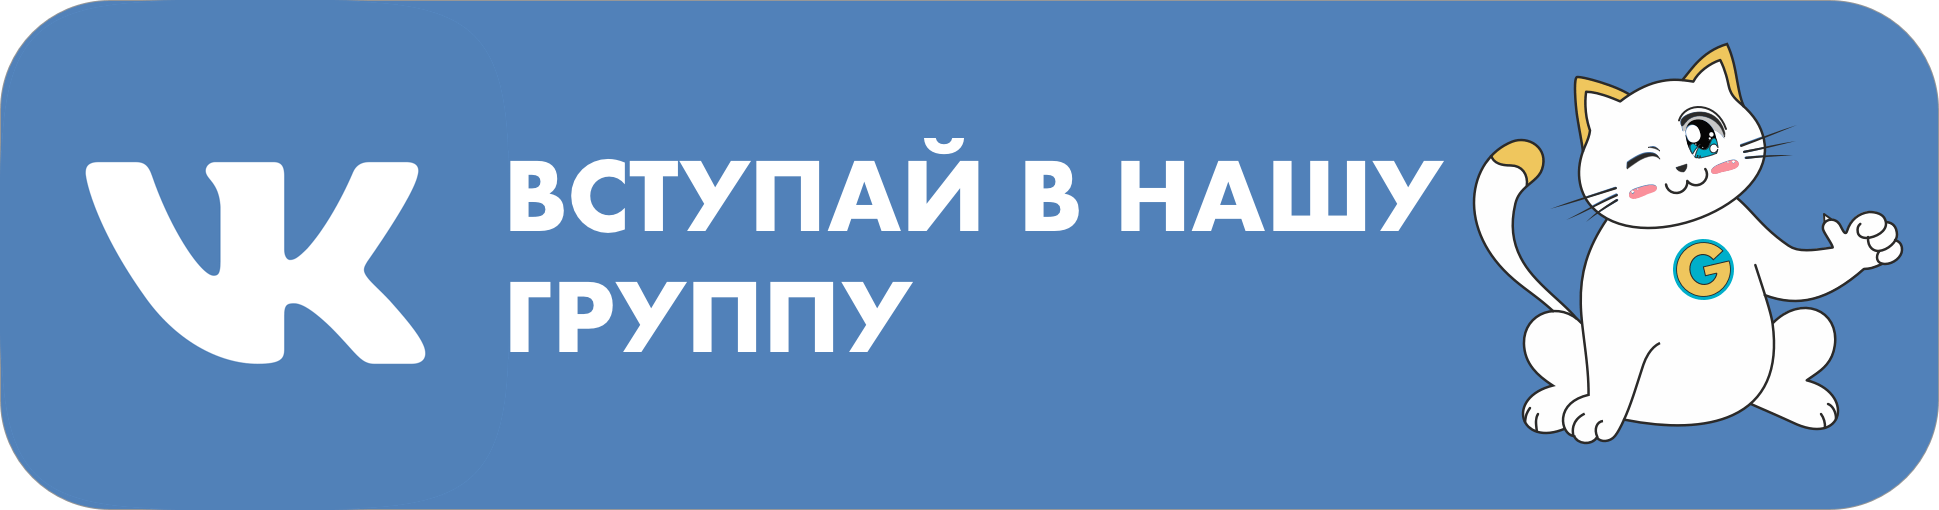 KZGDZ.COM ВКОНТАКТЕ